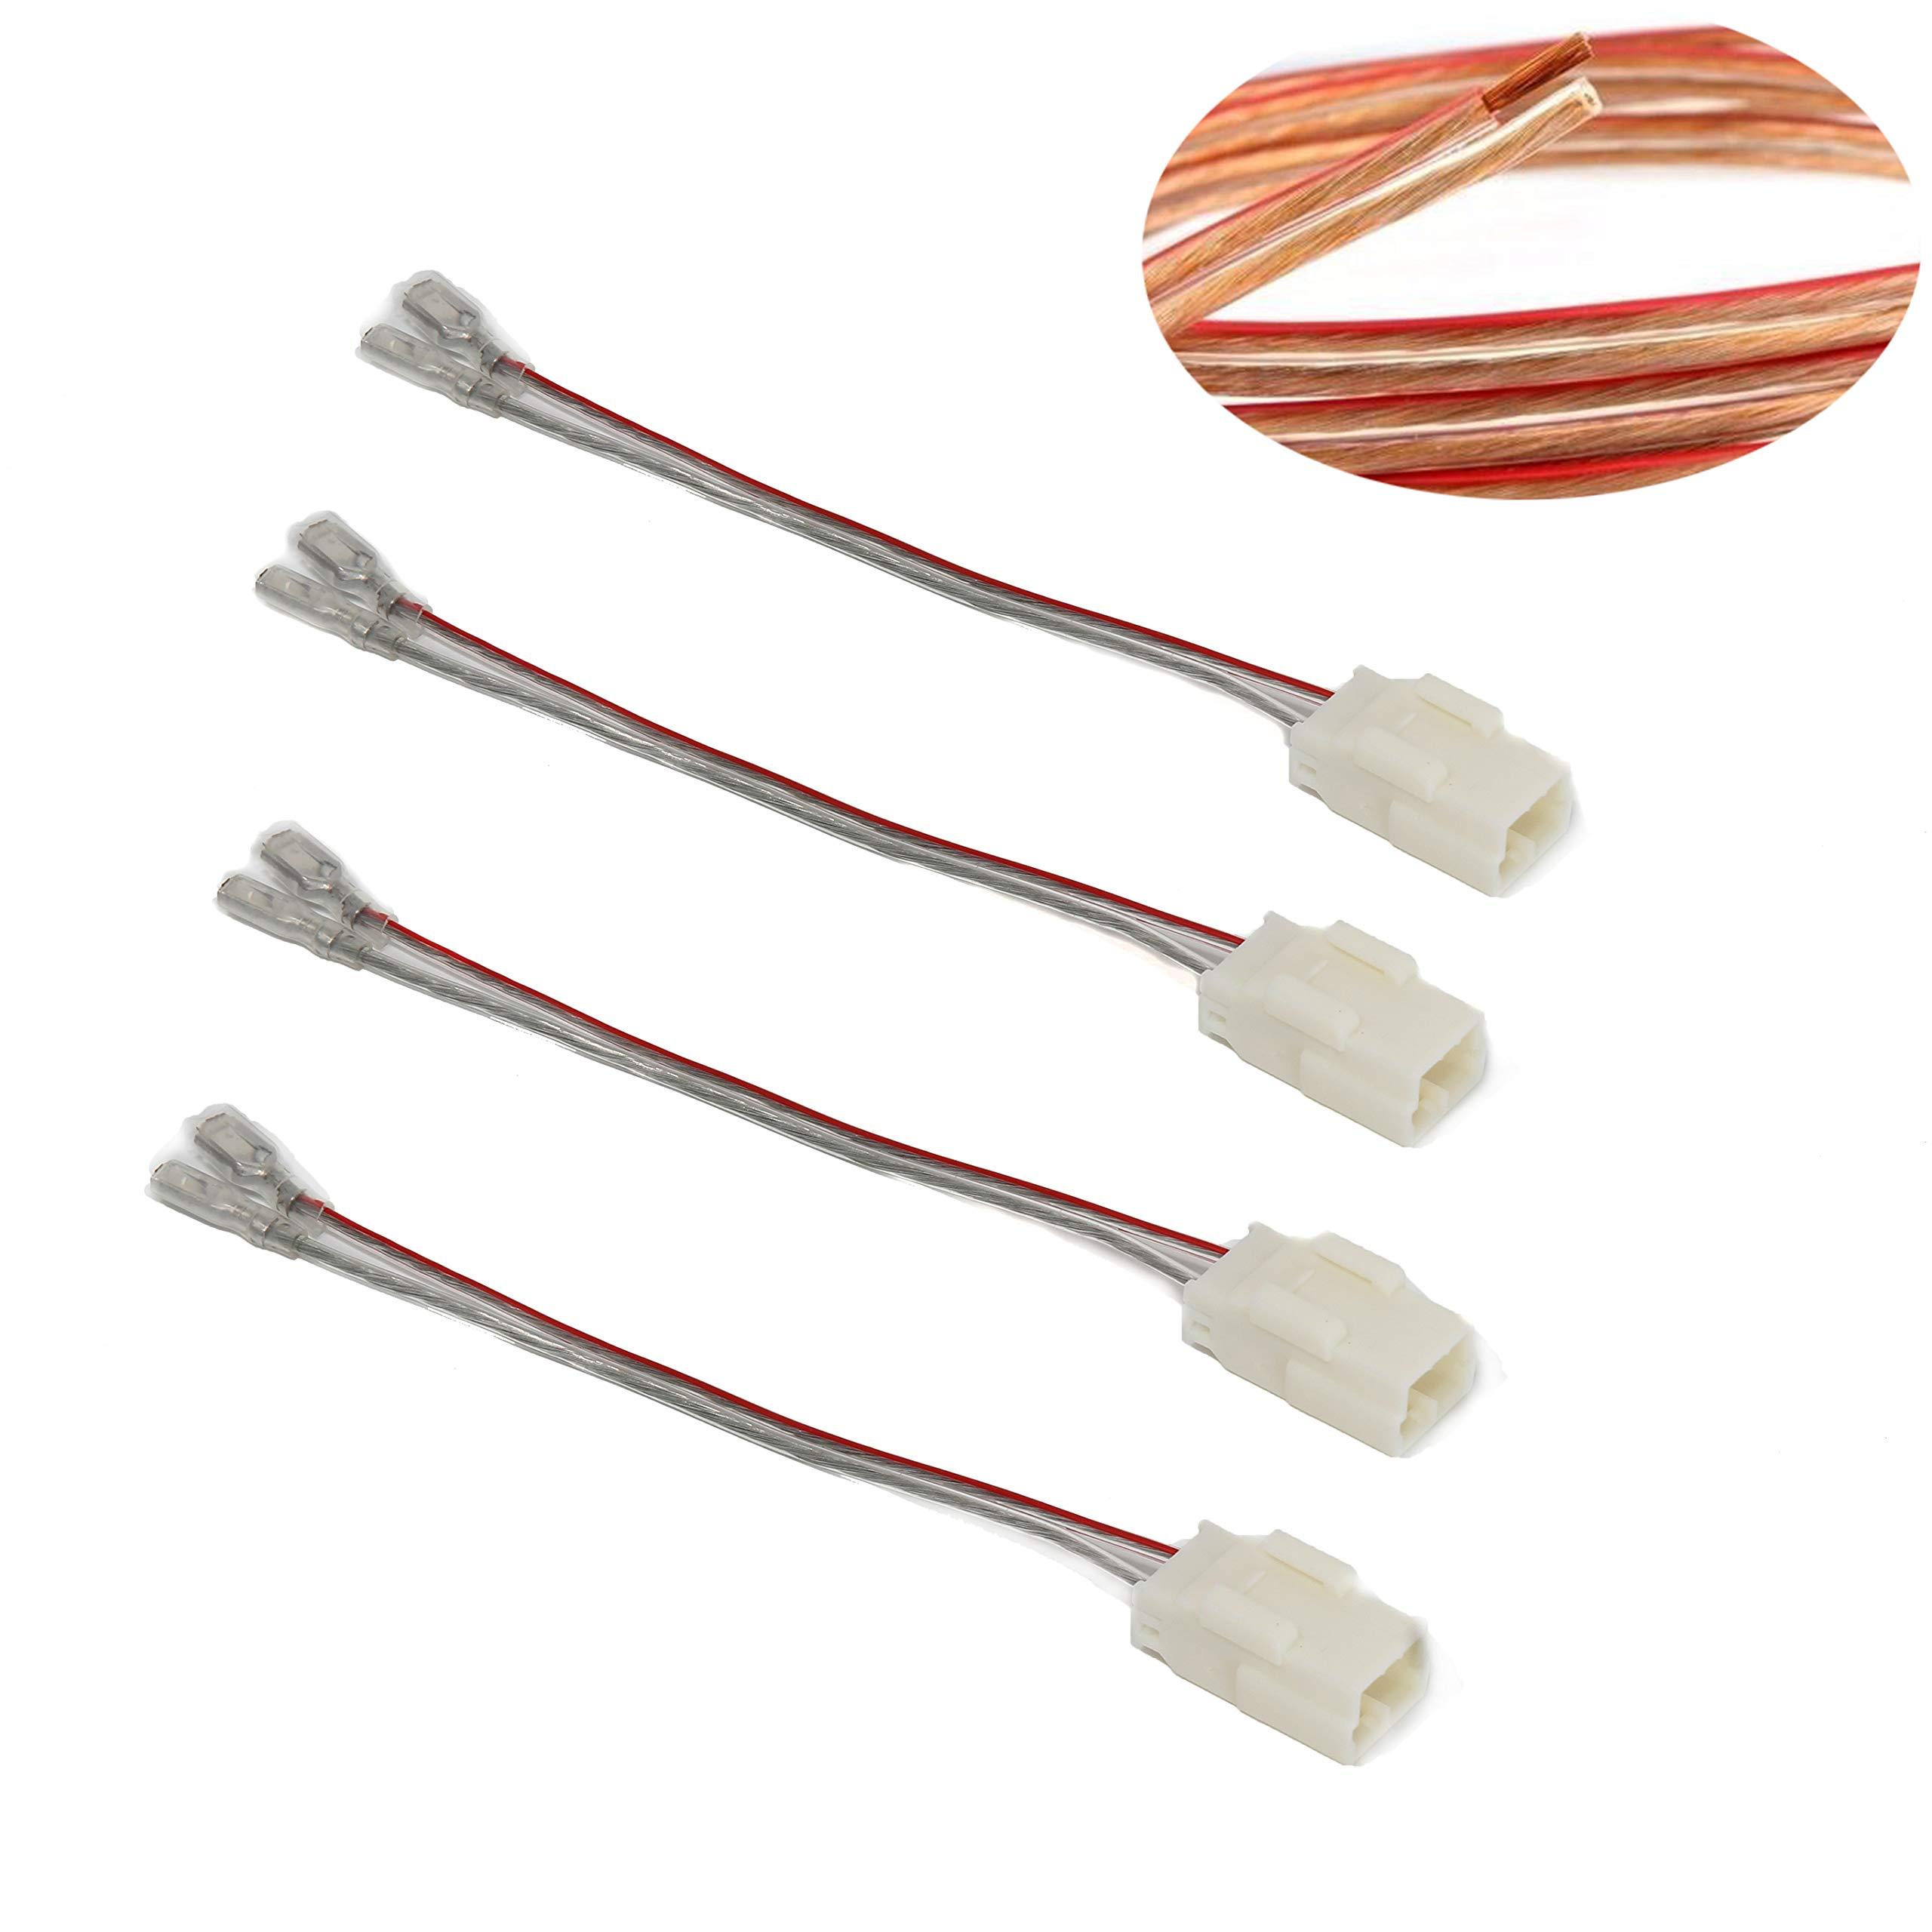 RedWolf for Chrysler Dodge RAM Vehicles Speaker Adapter Radio Aftermarket Wire Connector Harness Plug 4 pcs